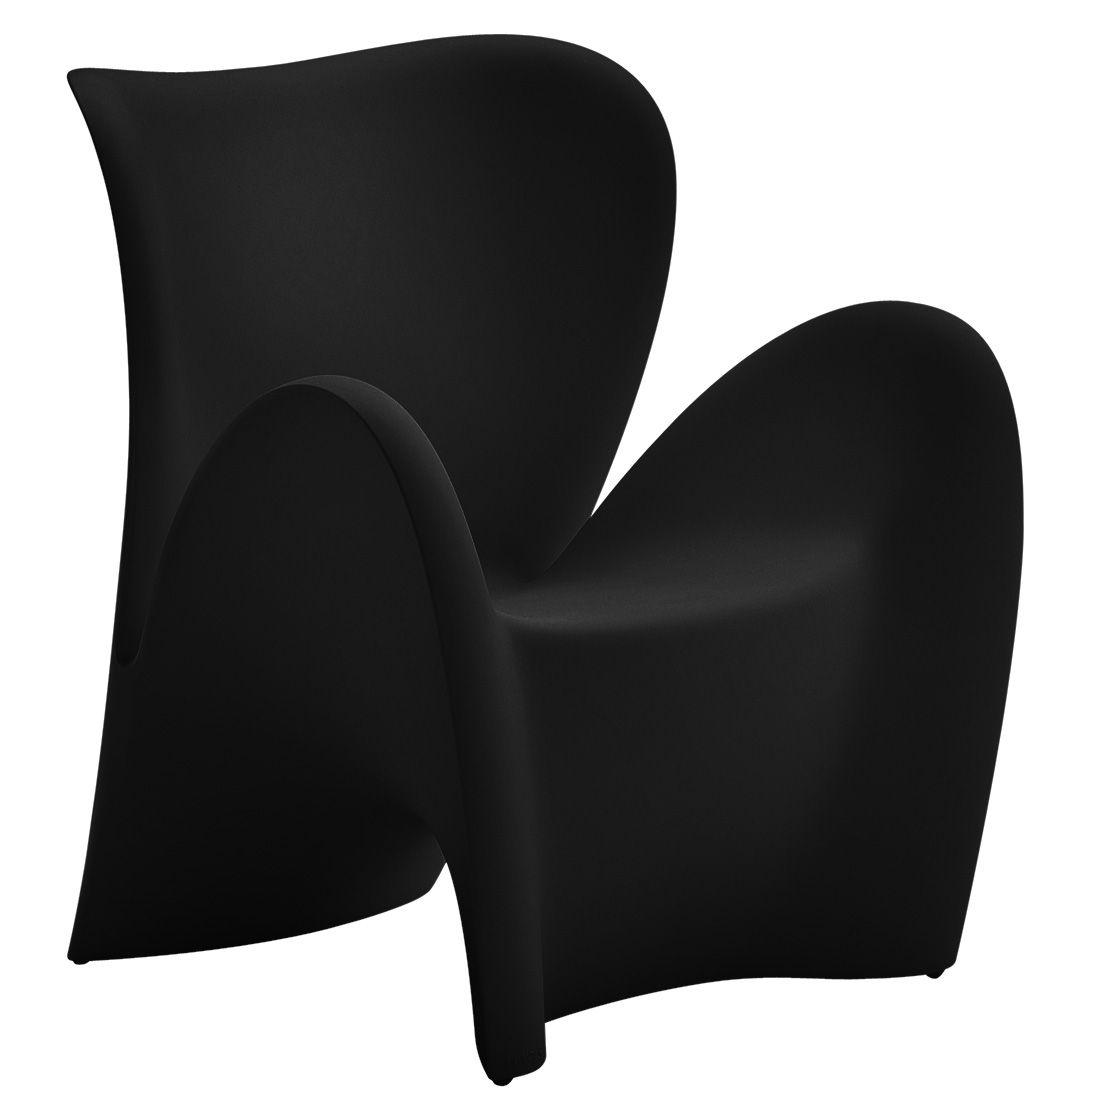 Furniture - Armchairs - Lily Armchair - Indoor & outdoor - Matt by MyYour - Black - Plastic material